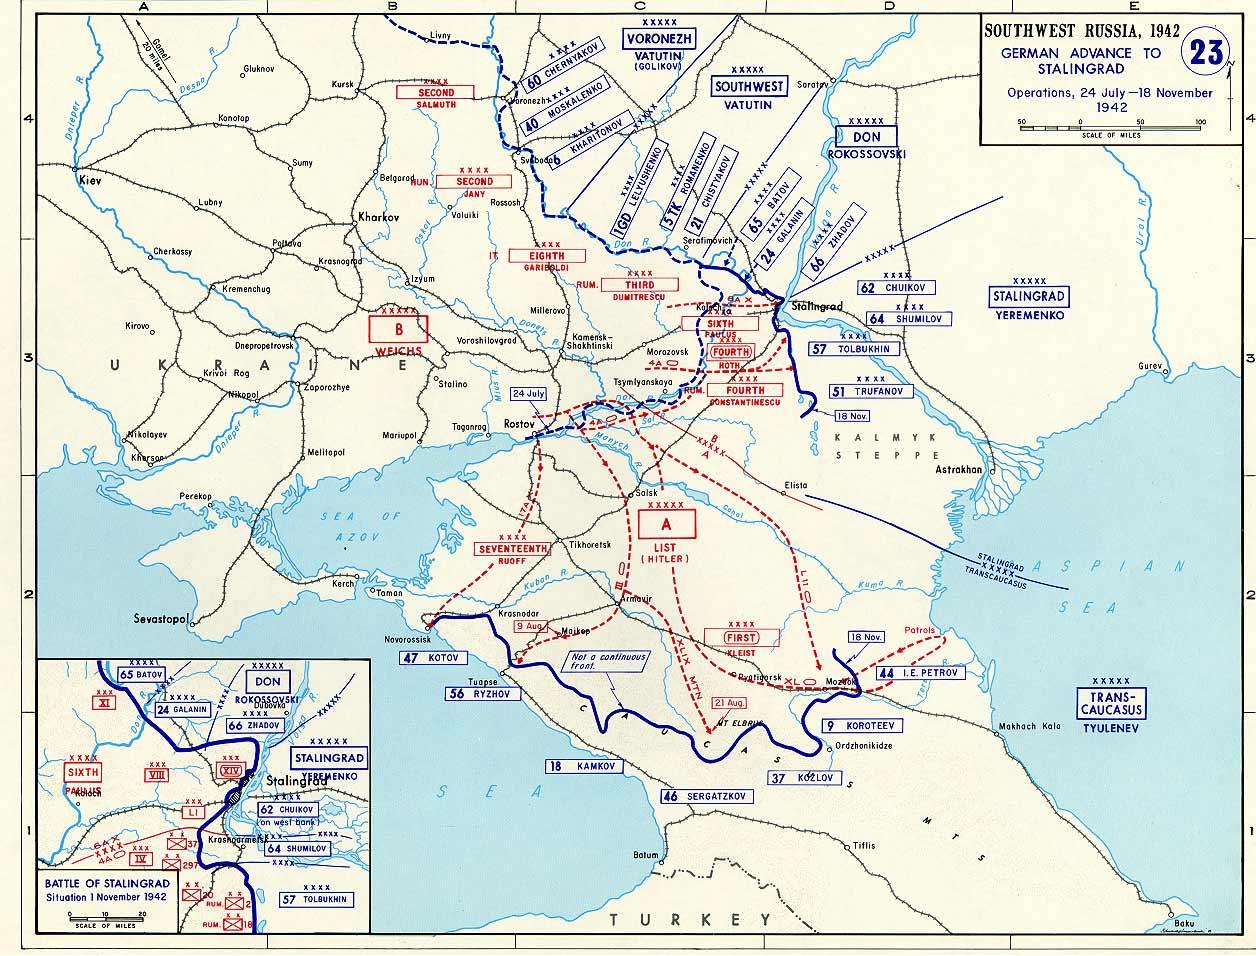 http://upload.wikimedia.org/wikipedia/commons/5/58/Ww2_map23_july42_Nov_42.jpg